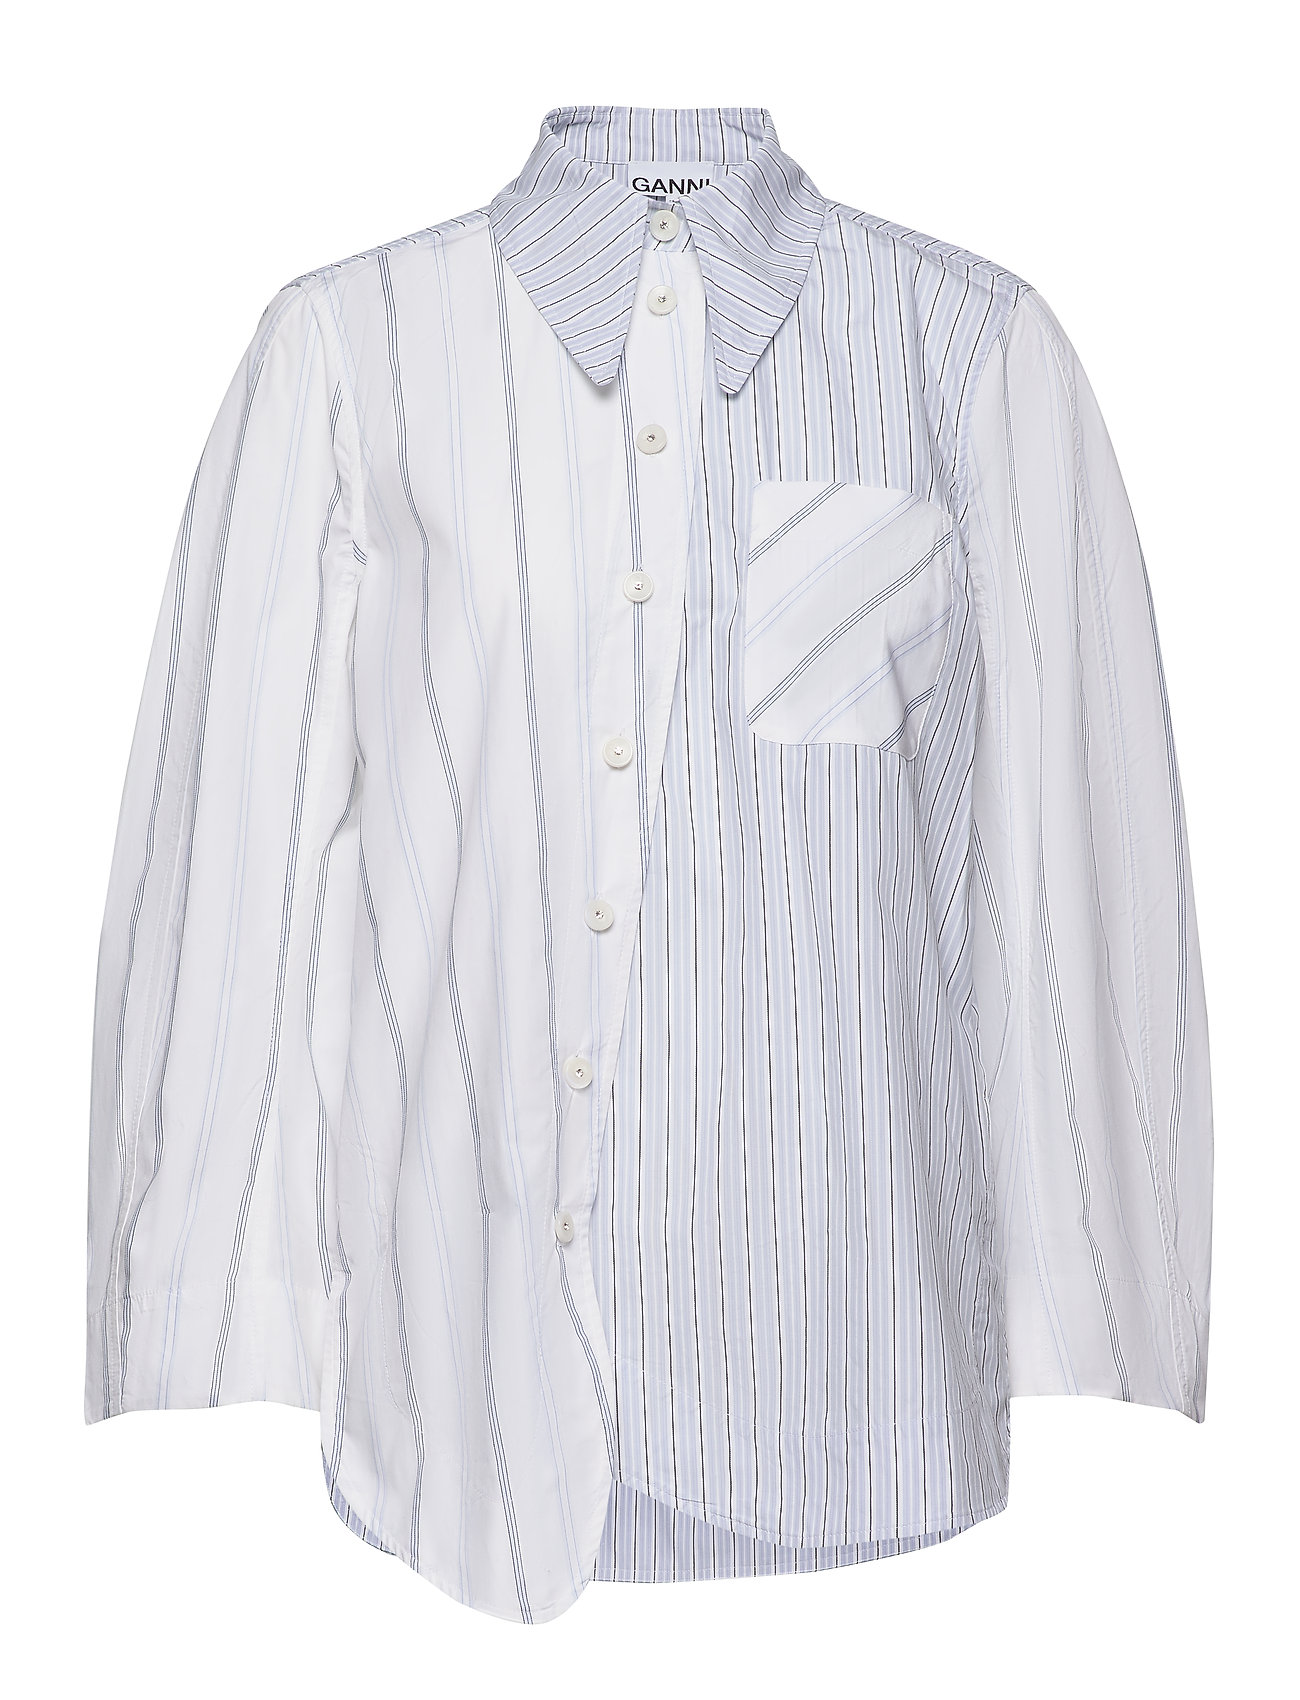 Ganni Shirting Cotton - BLOCK COLOUR